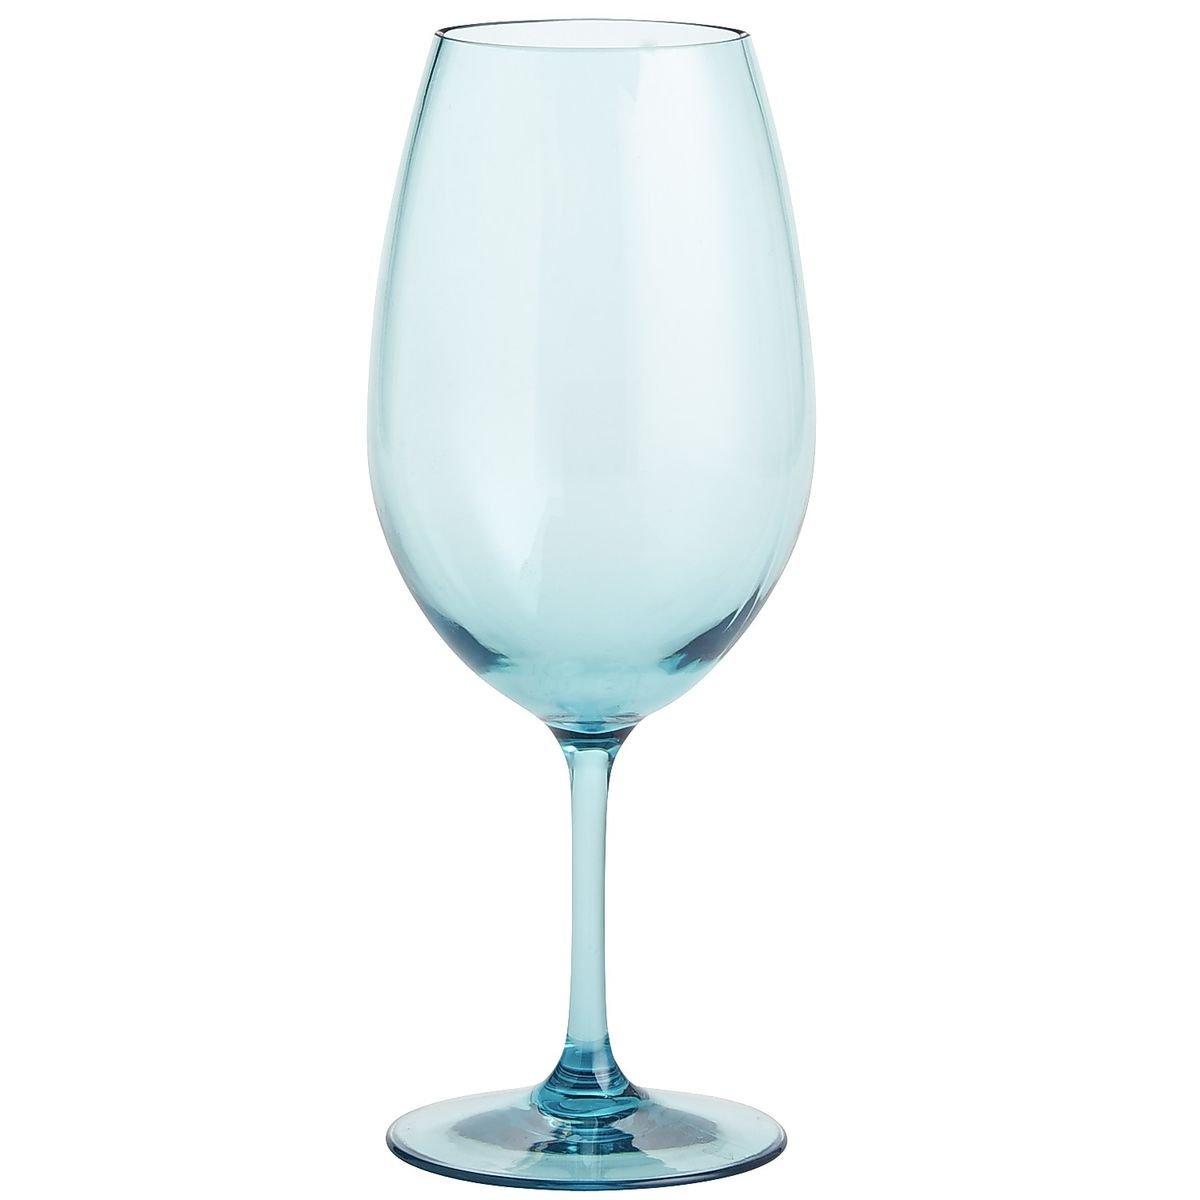 Clarity turquoise copa vino blanco sears com mx me for Copa vino blanco